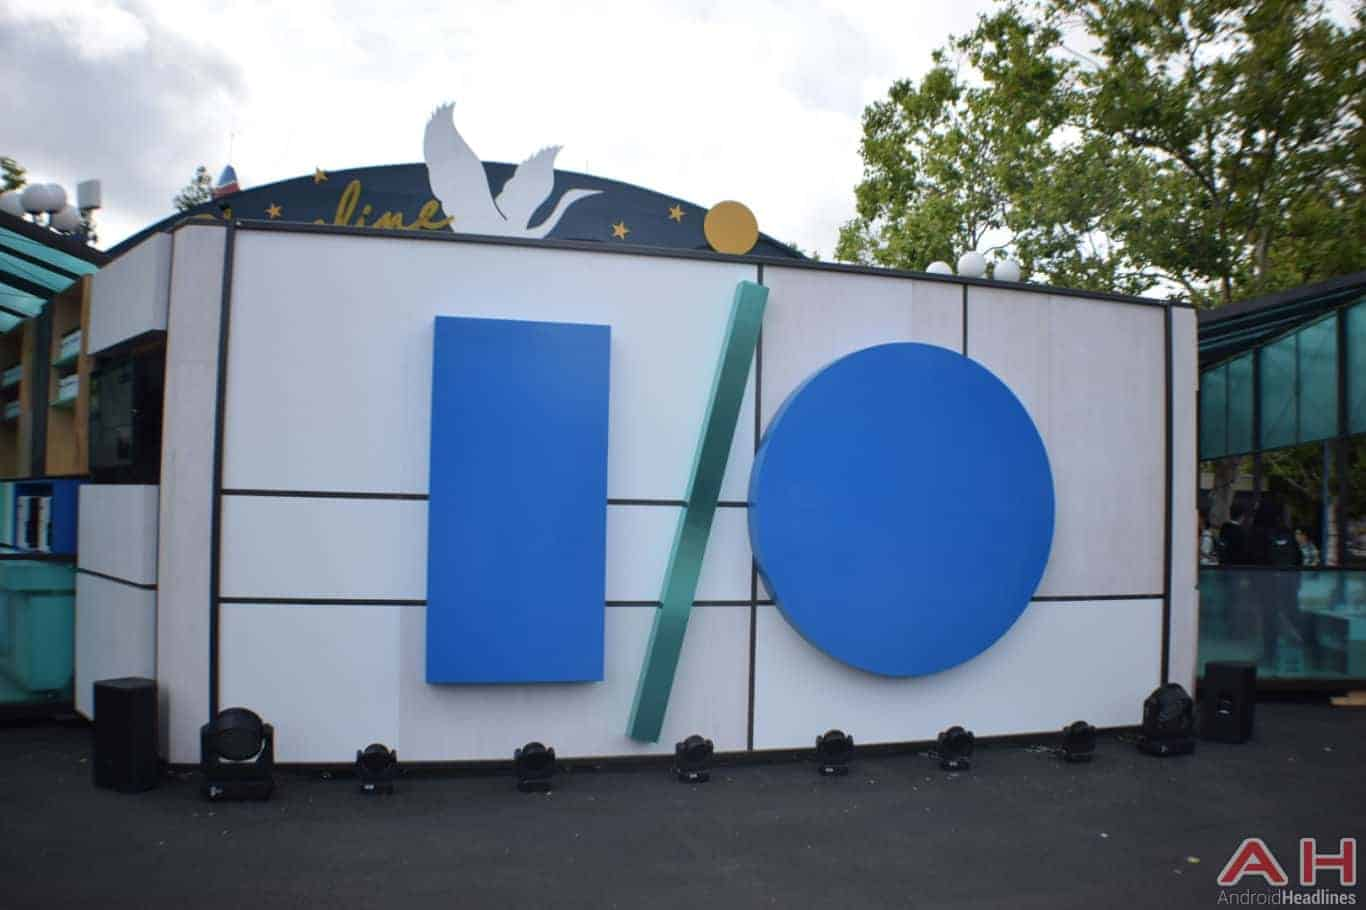 Google IO 2017 Signage Logo AH 3